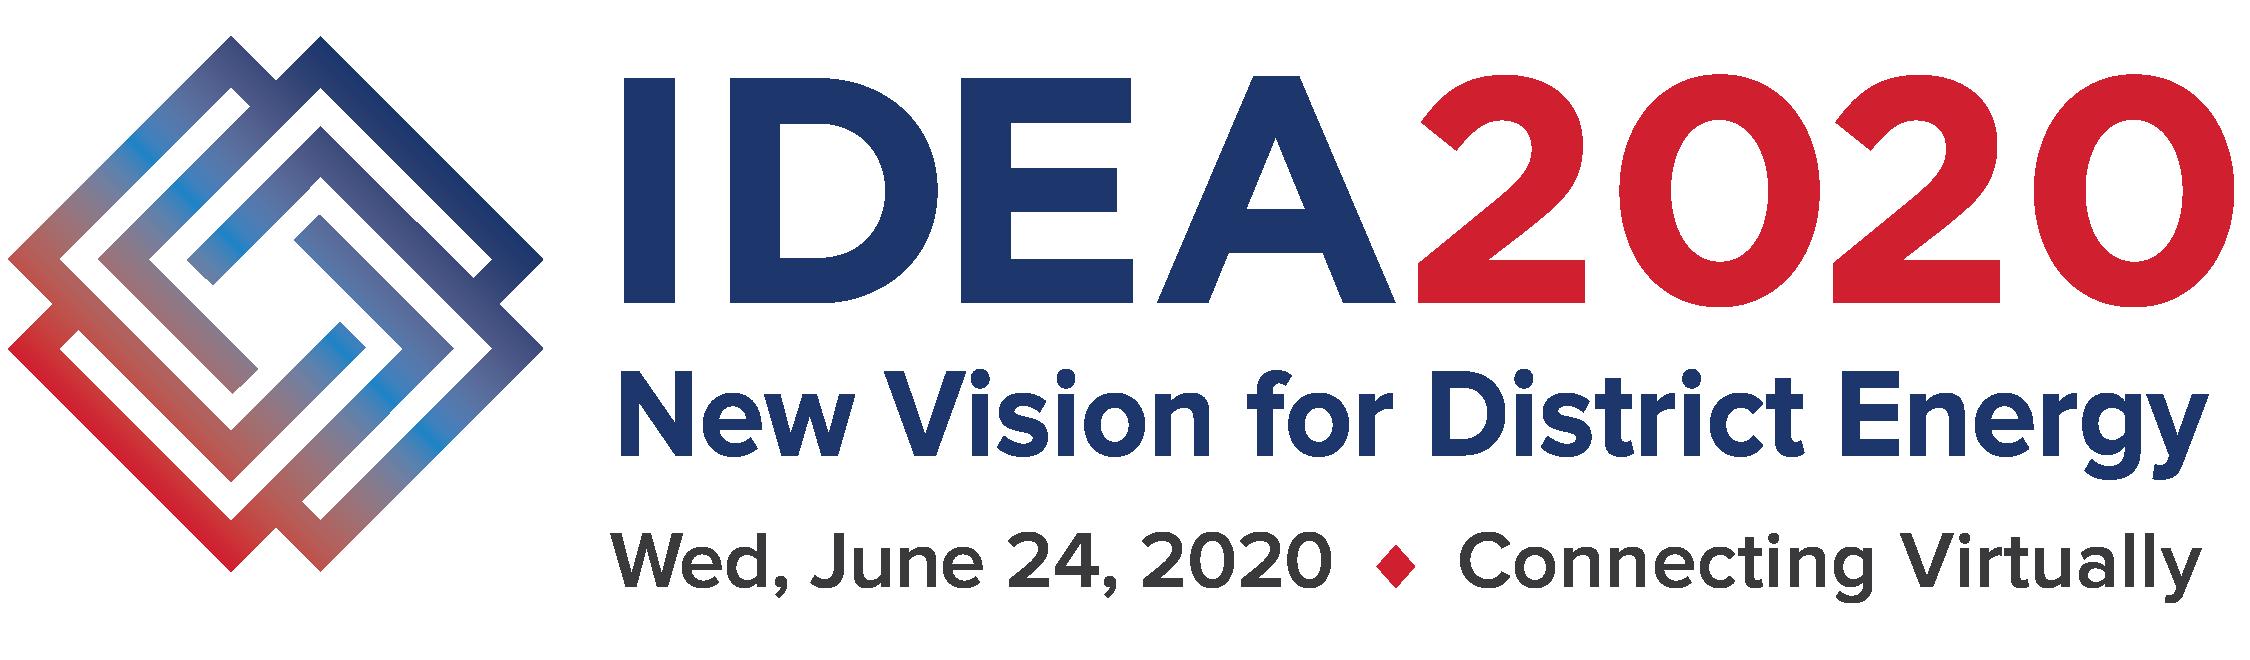 IDEA2020